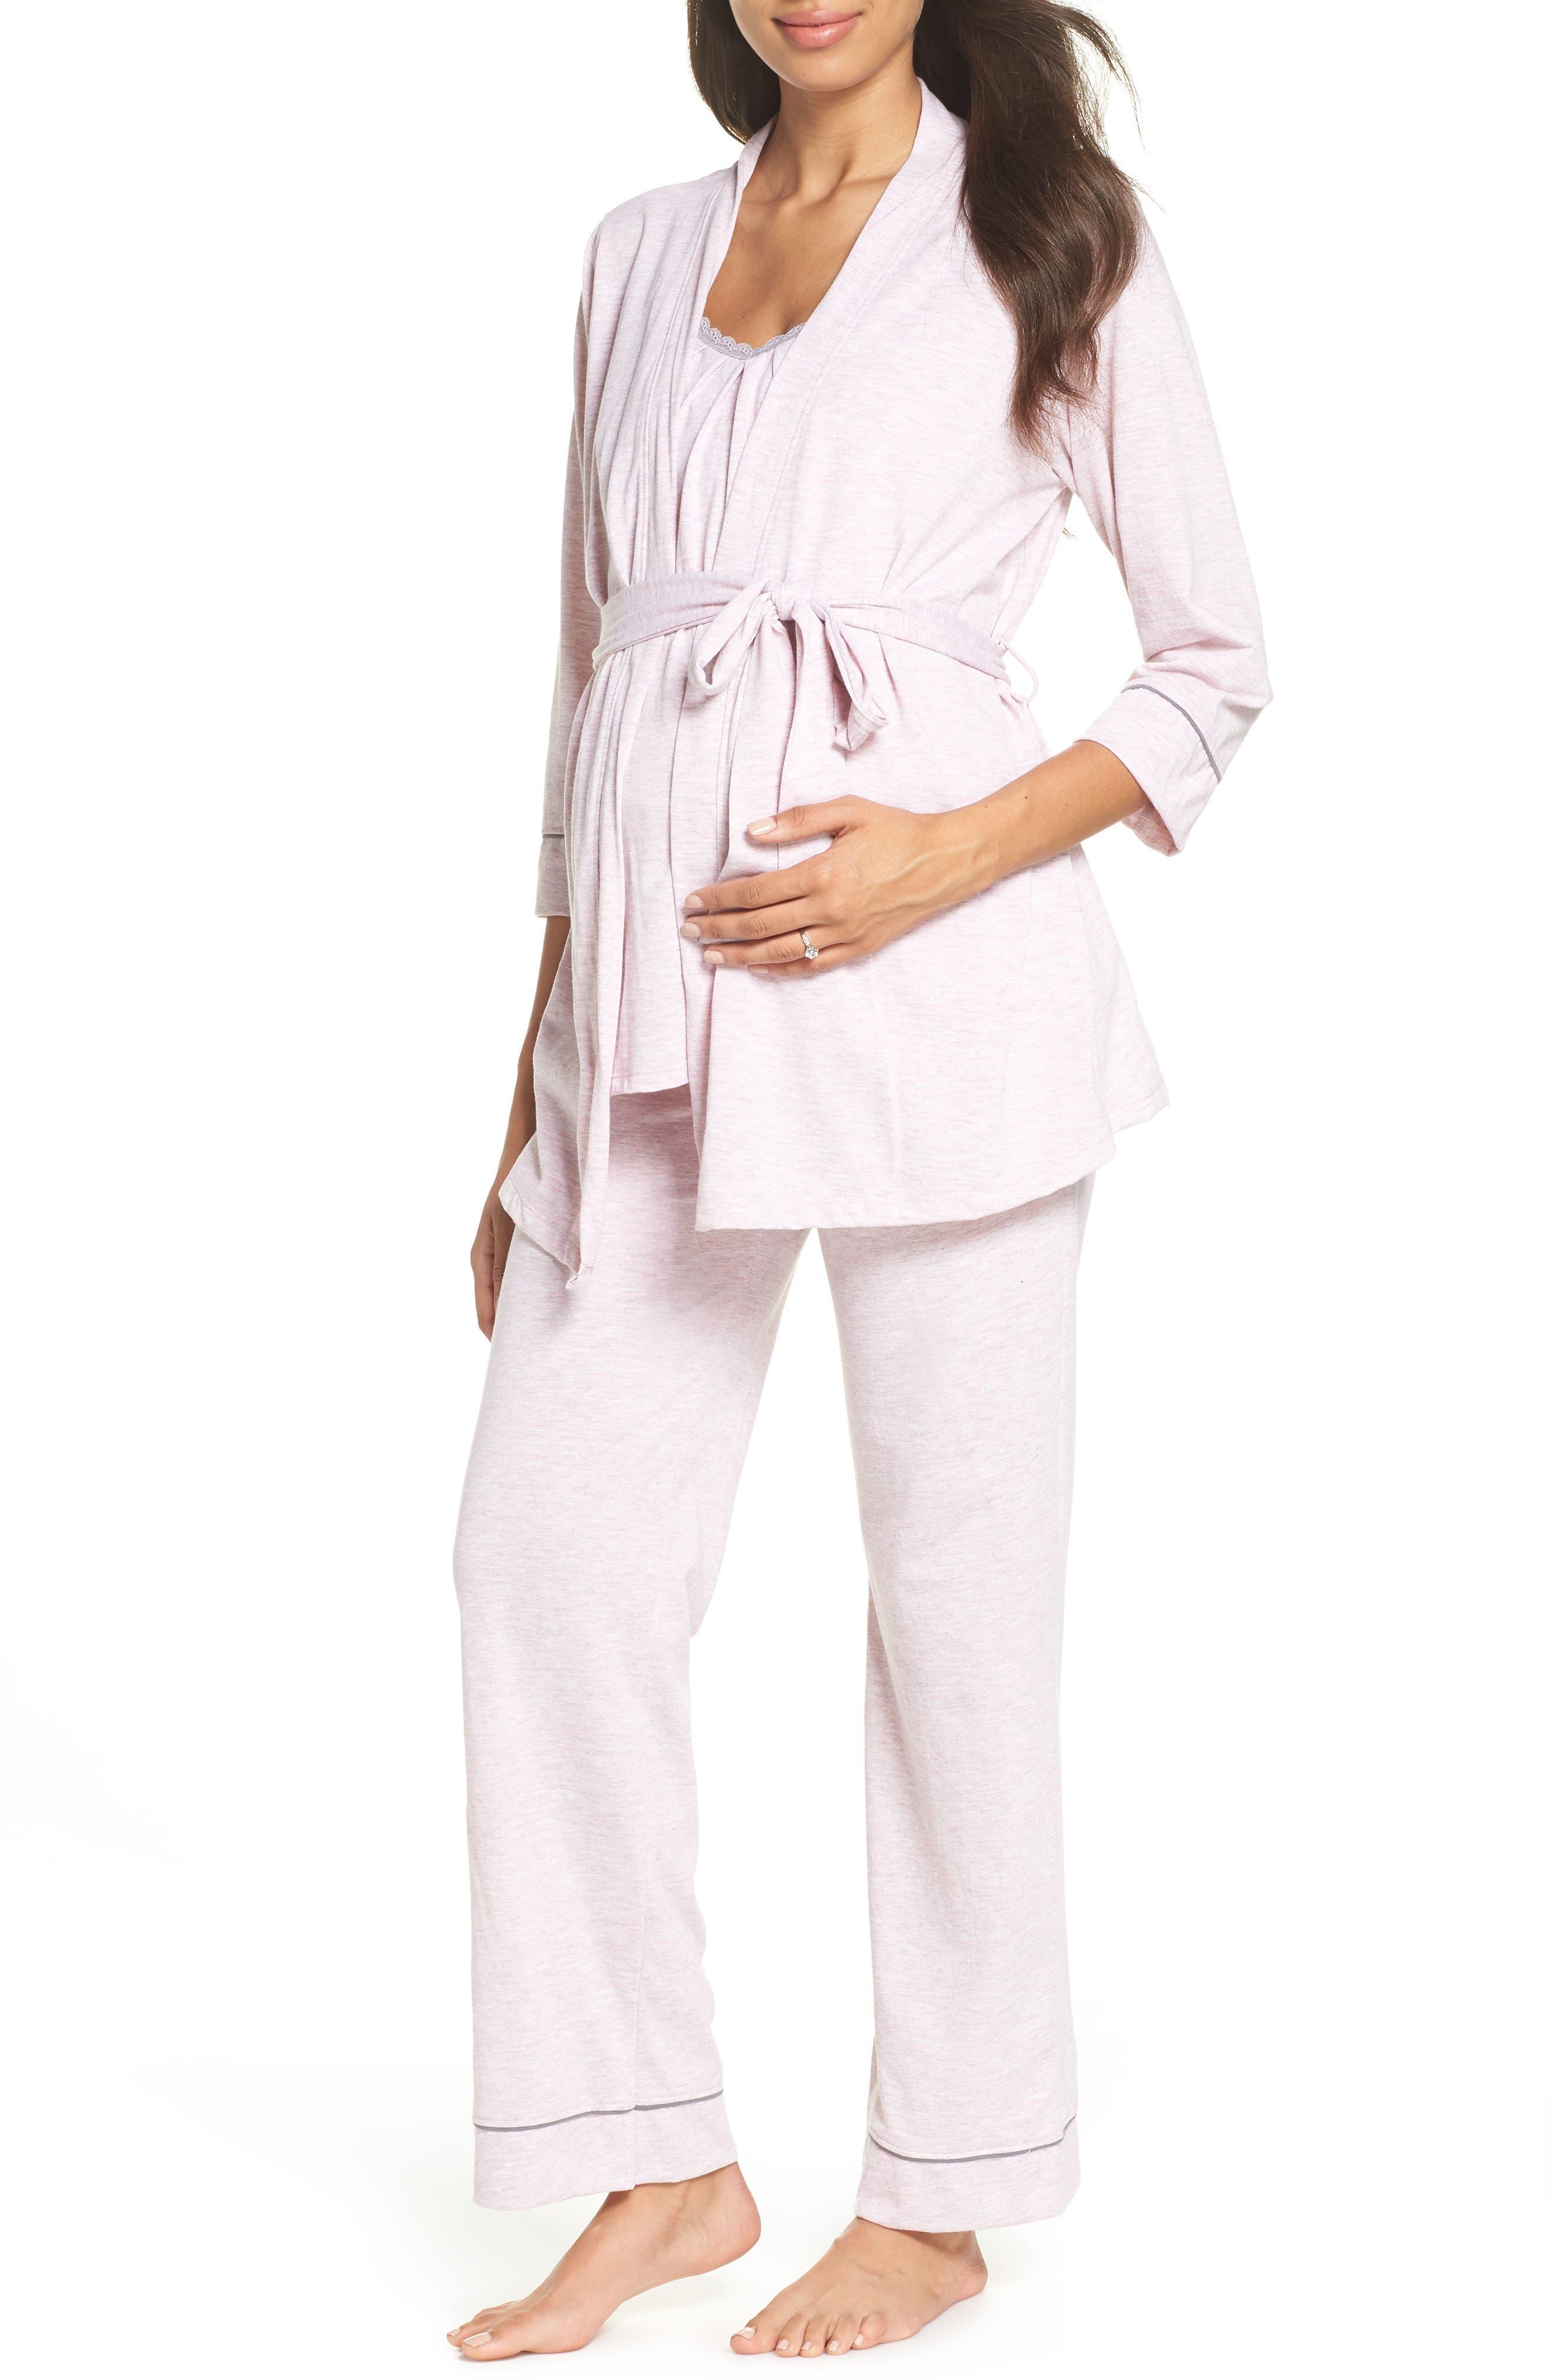 0ed4eaf8a134c belabumbum shop for women - women's belabumbum catalogue - Cools.com